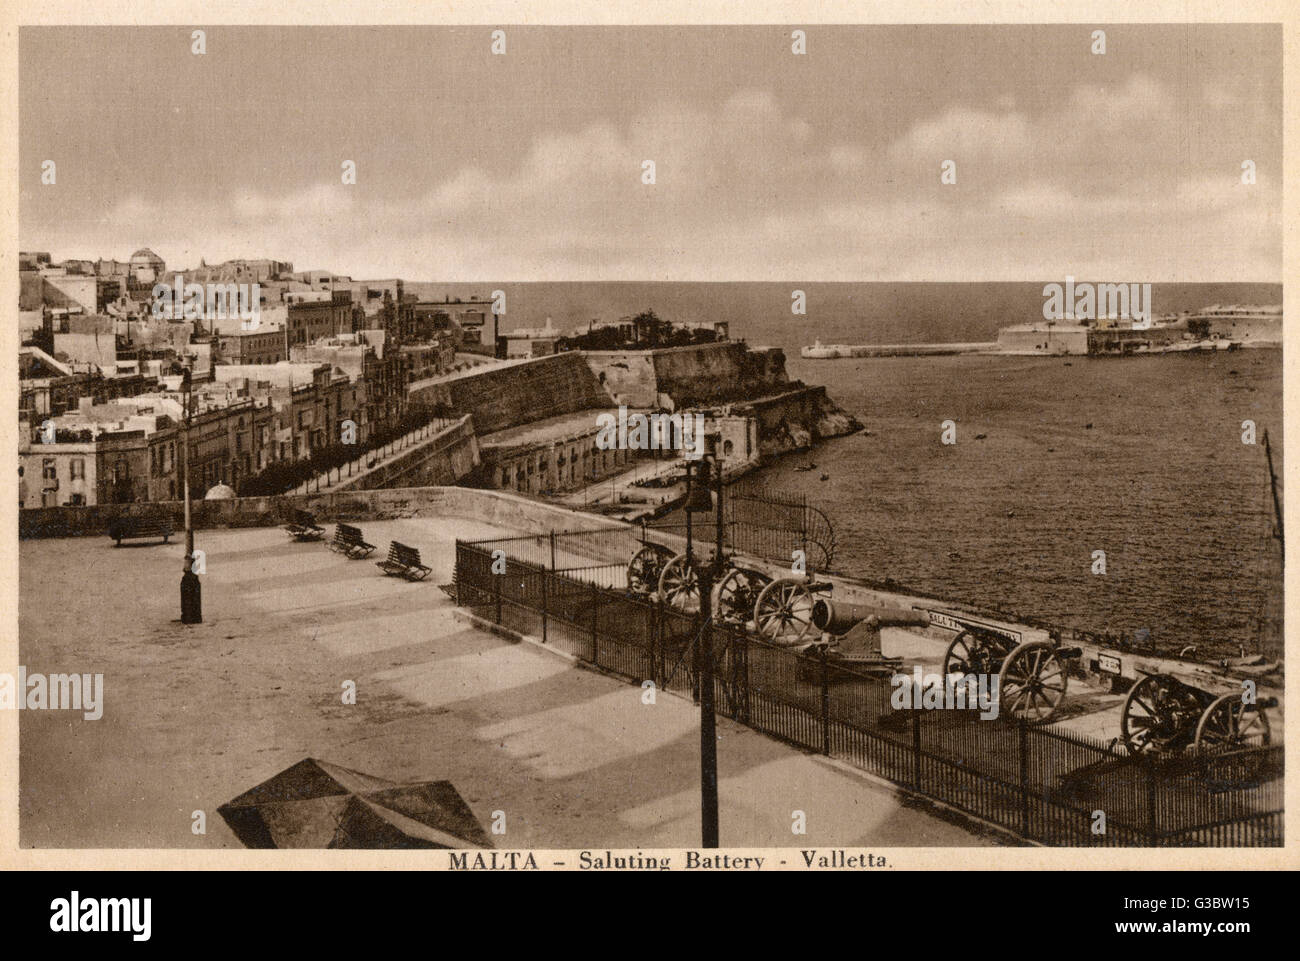 Malta - Valletta - The saluting battery     Date: circa 1920s - Stock Image